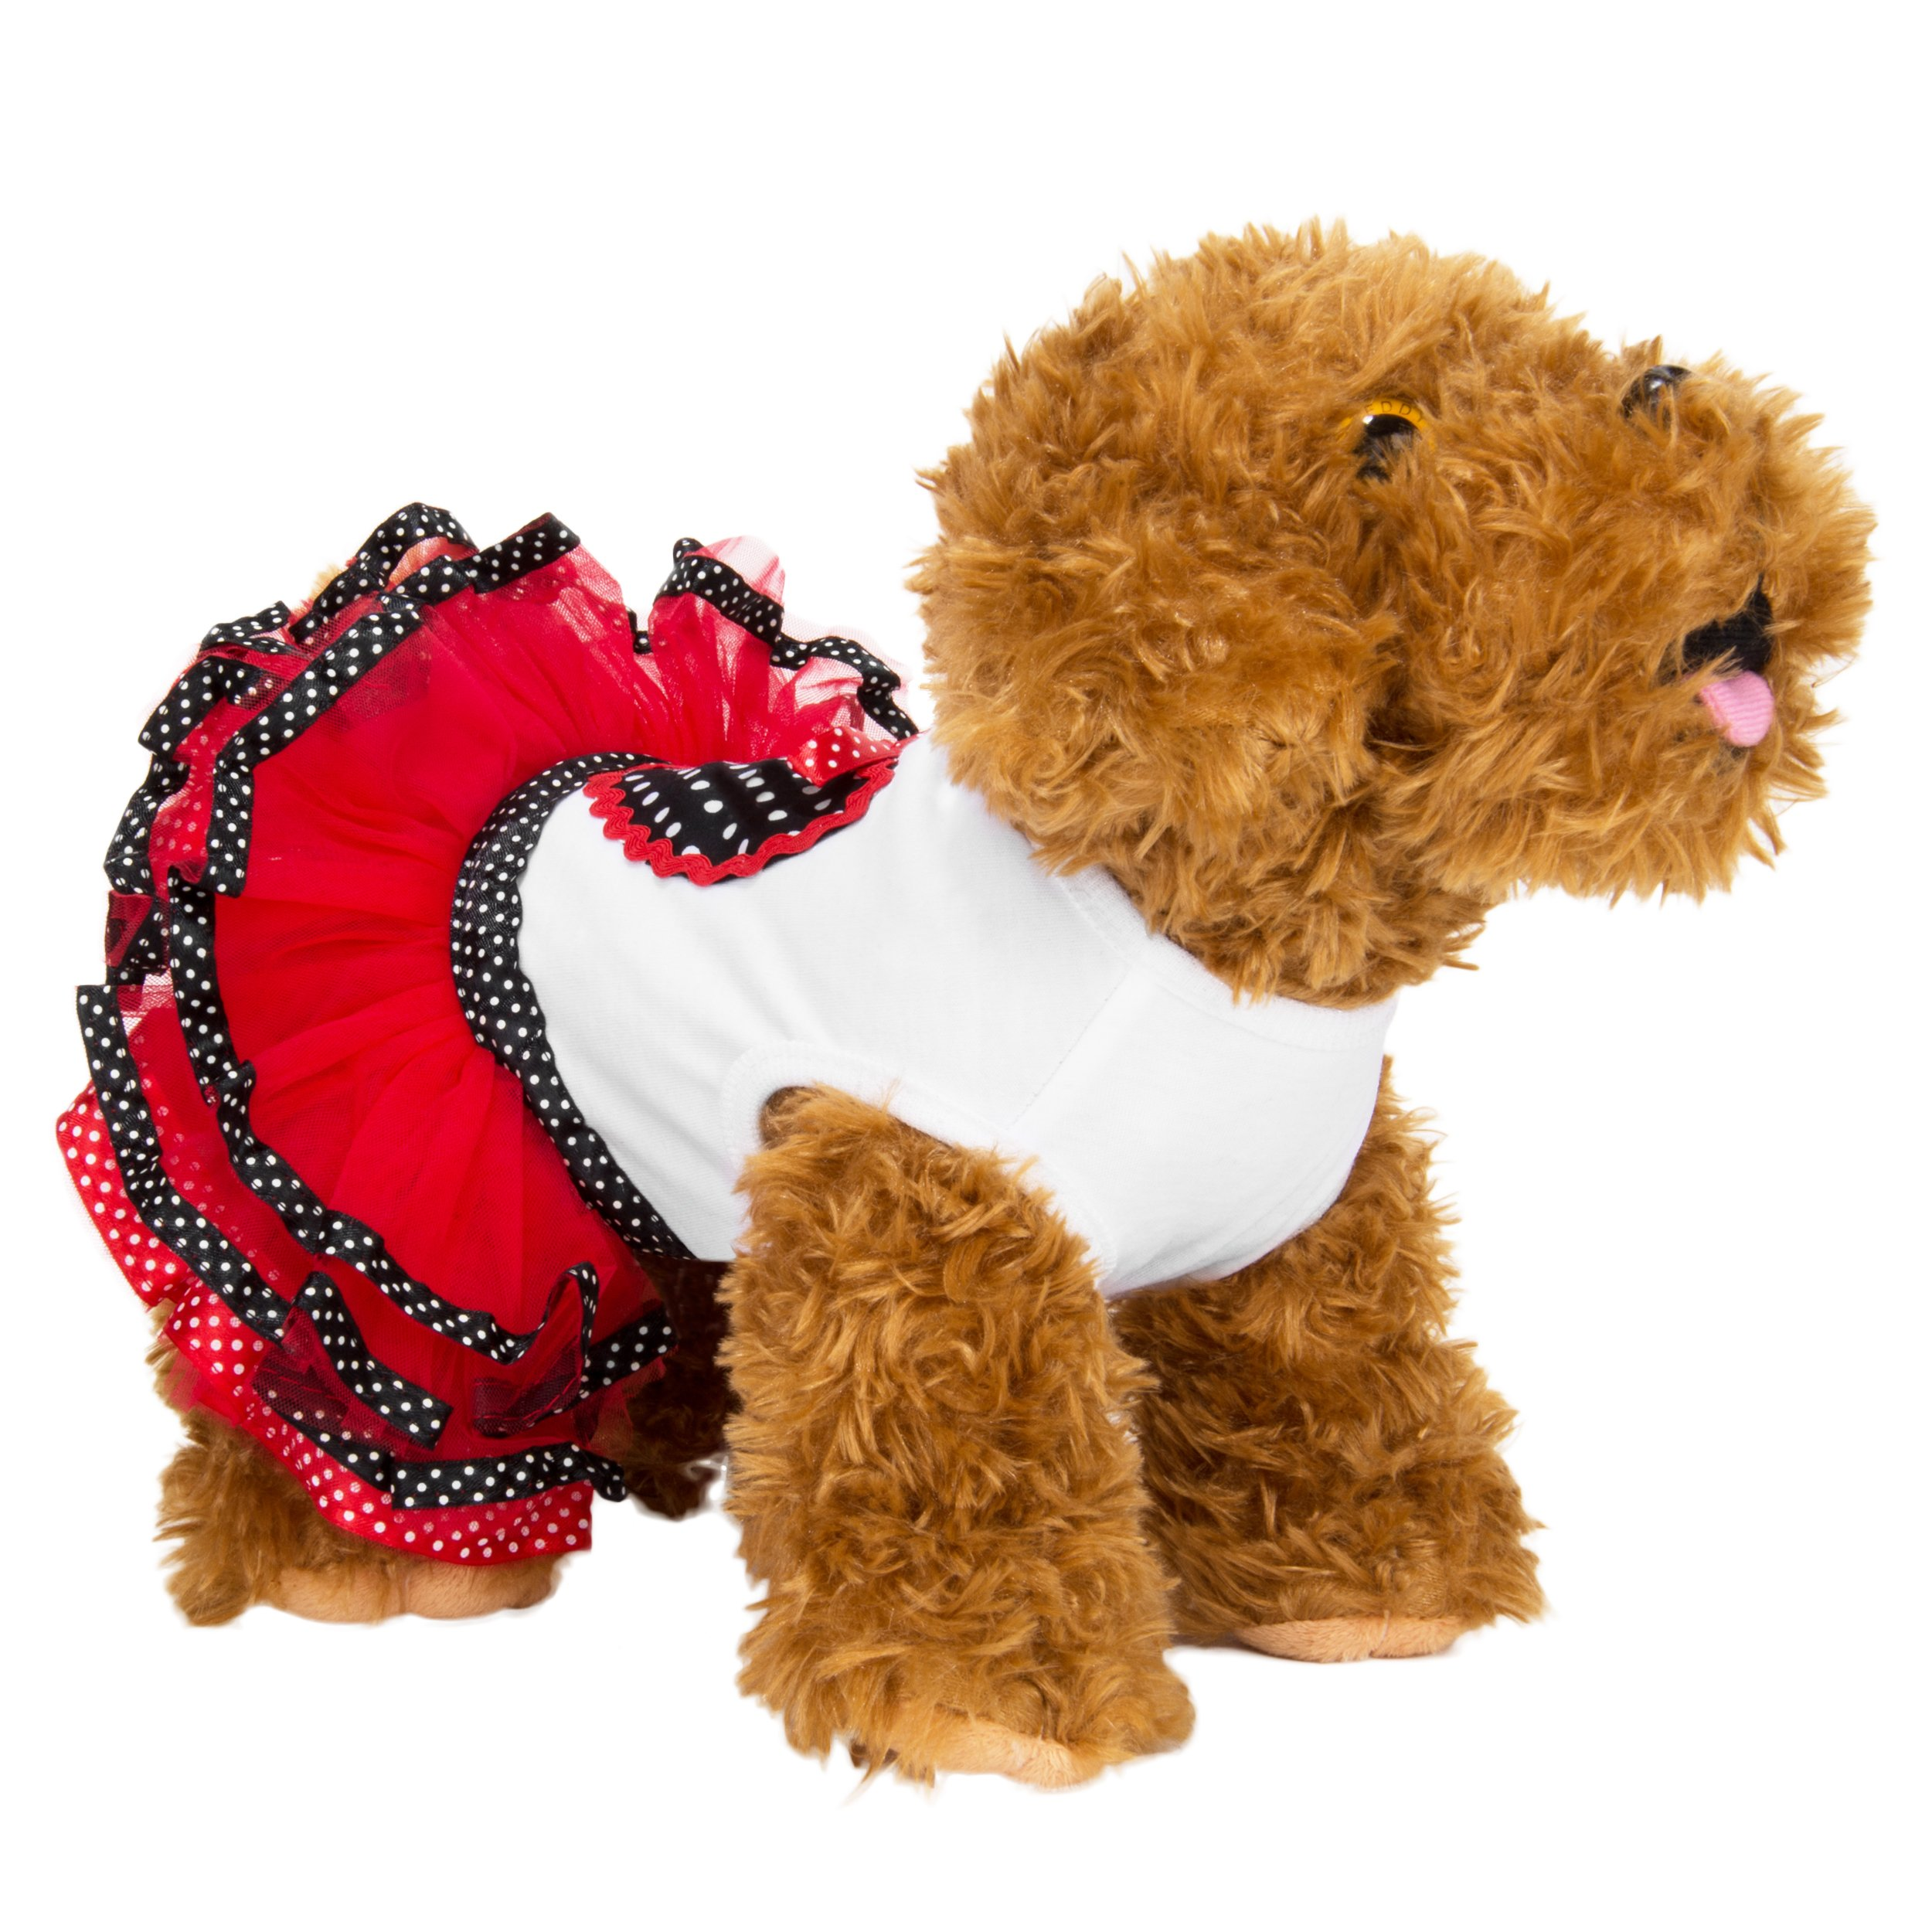 CueCue Pet Minnie Polka Dot Ruffled Dress, Black/Red/White, Small